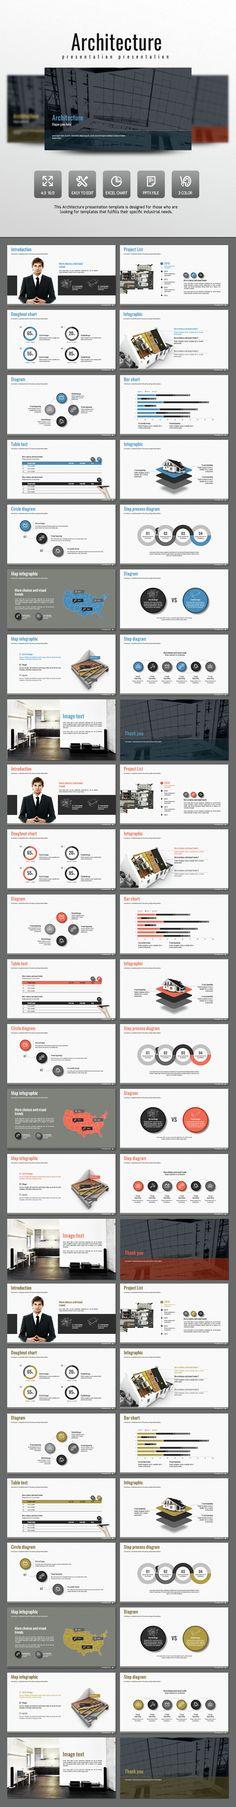 F5 powerpoint presentation architecture powerpoint templates presentation templates toneelgroepblik Gallery